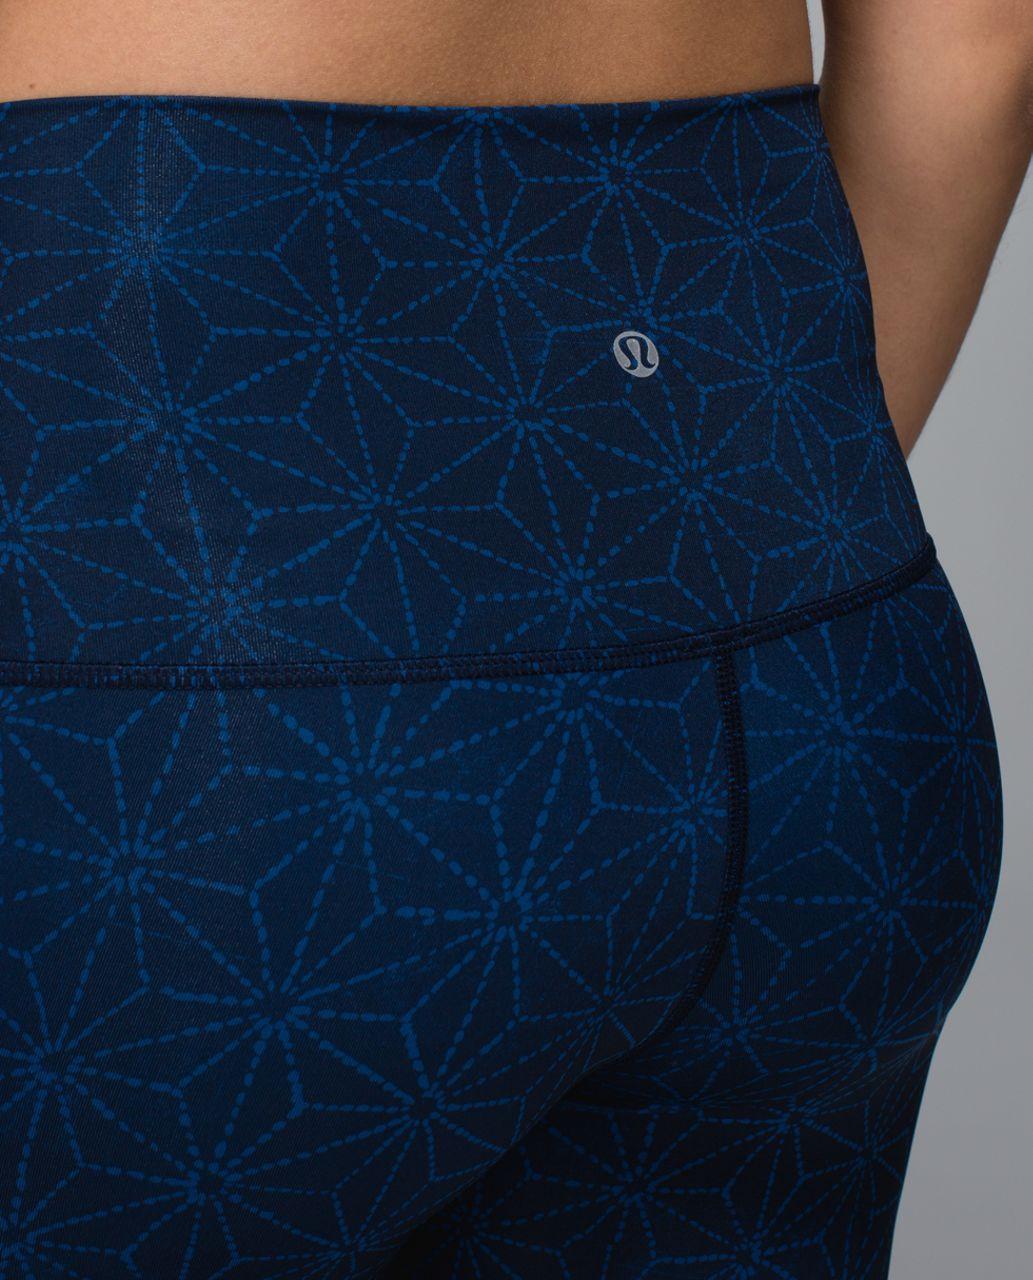 Lululemon Wunder Under Pant *Full-On Luxtreme (Roll Down) - Exploded Sashico Star Inkwell Rugged Blue